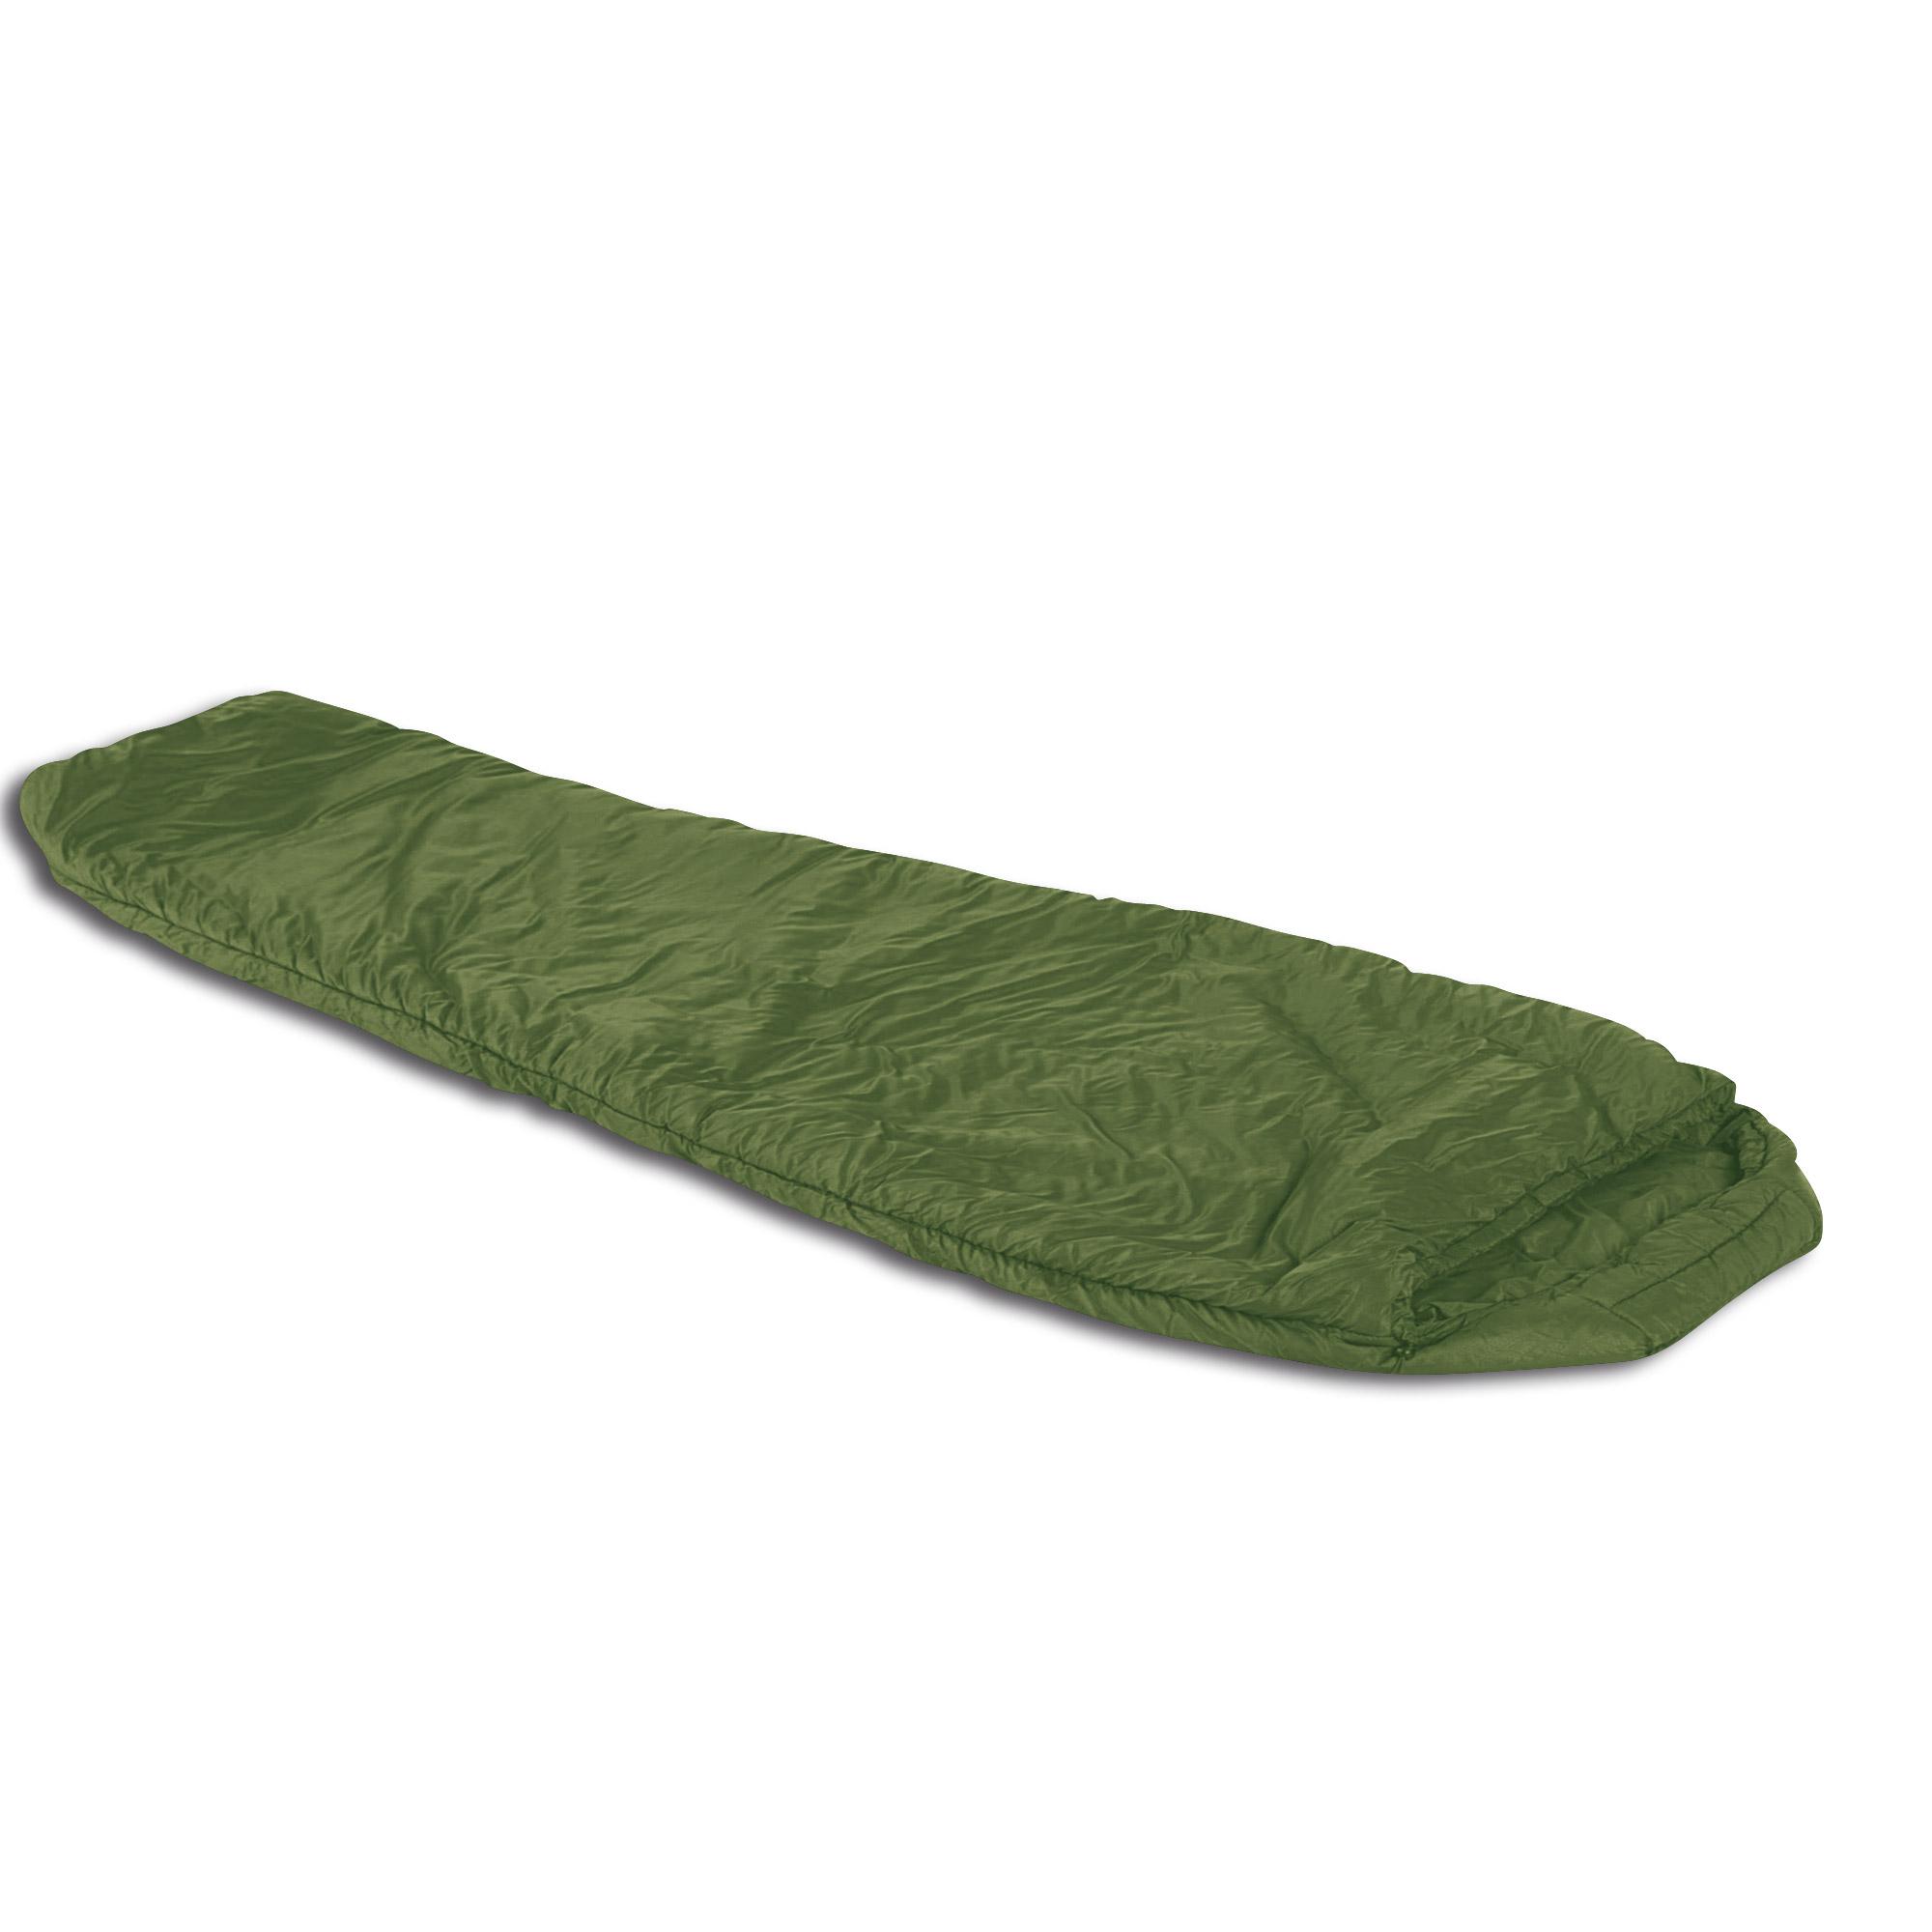 Sleeping Bag Softie 6 Kestrel